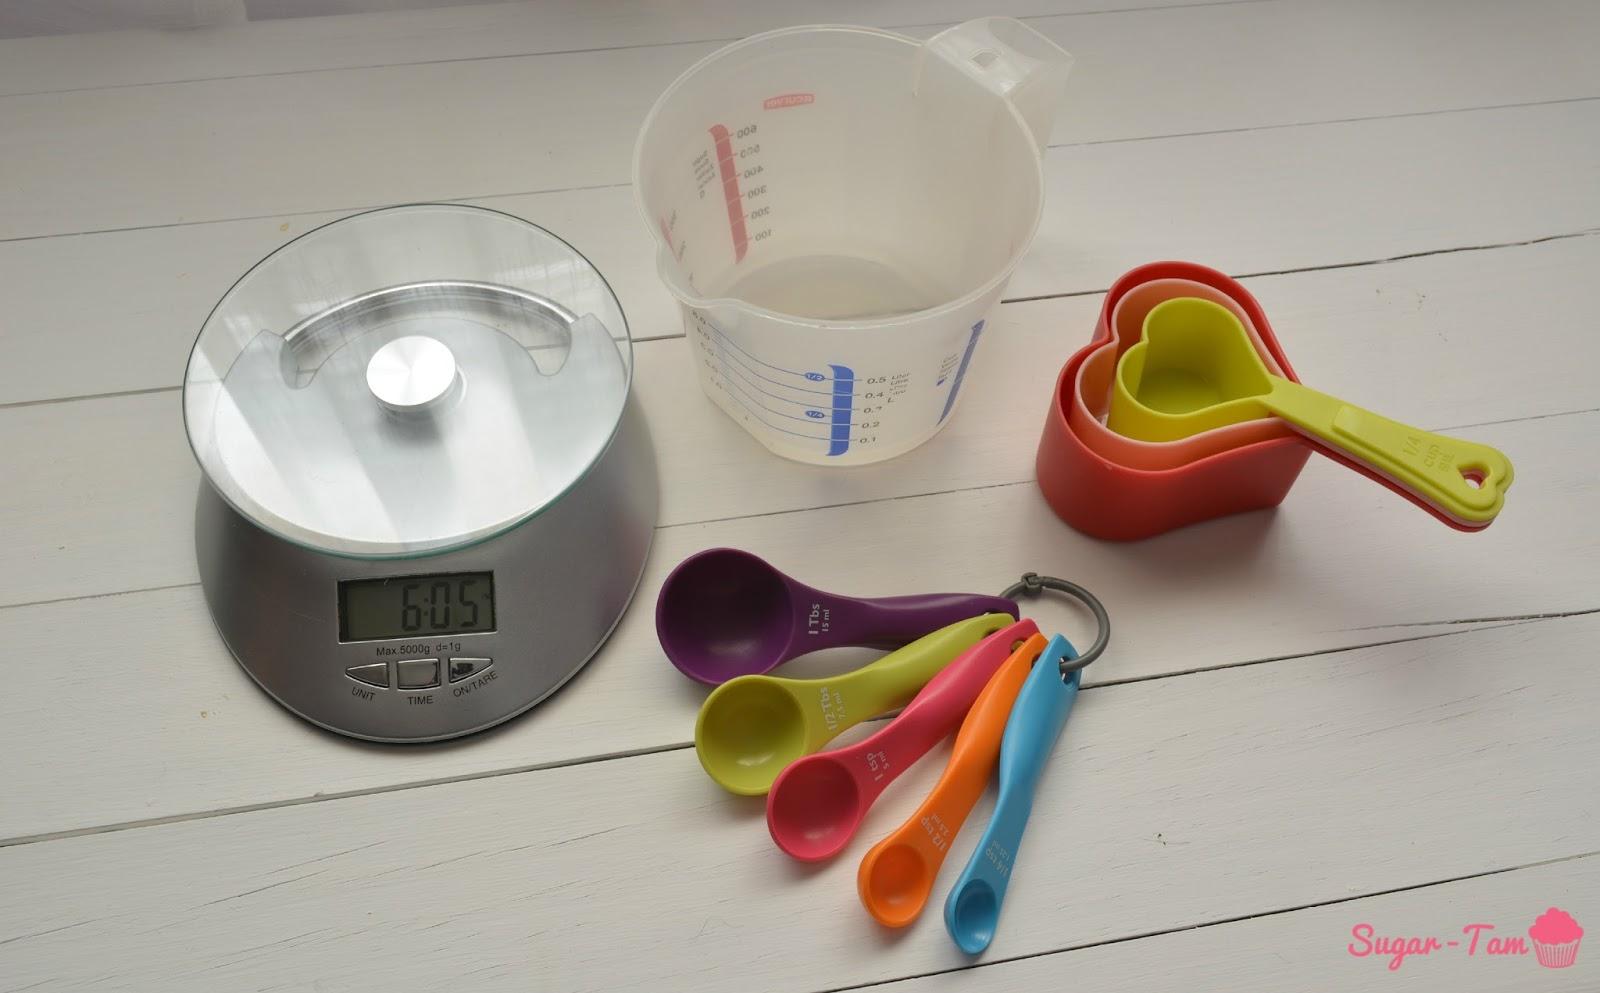 Sugartam blog de postres 15 utensilios b sicos de pasteler a for Utensilios de cocina para zurdos